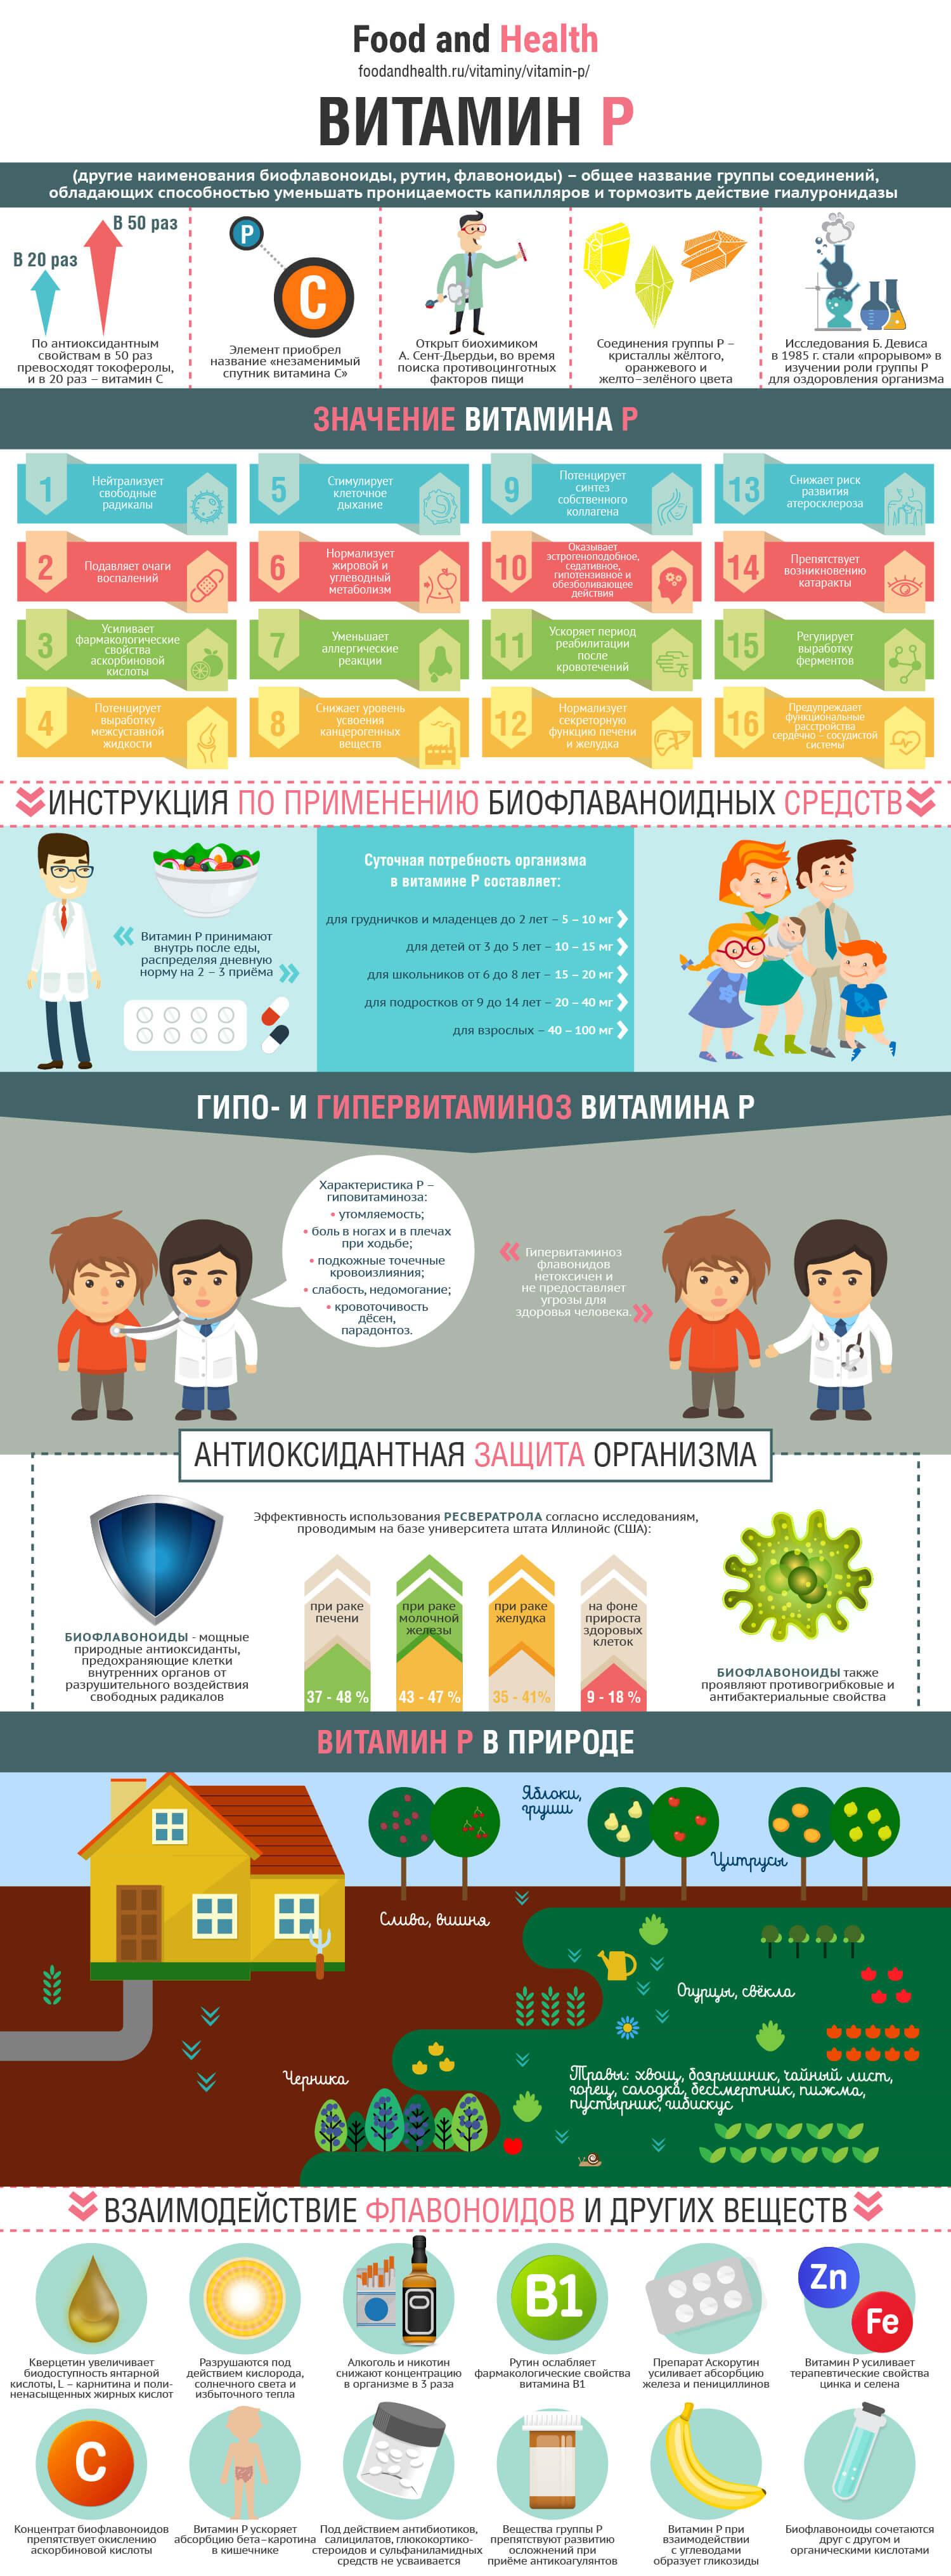 Витамин P: инфографика